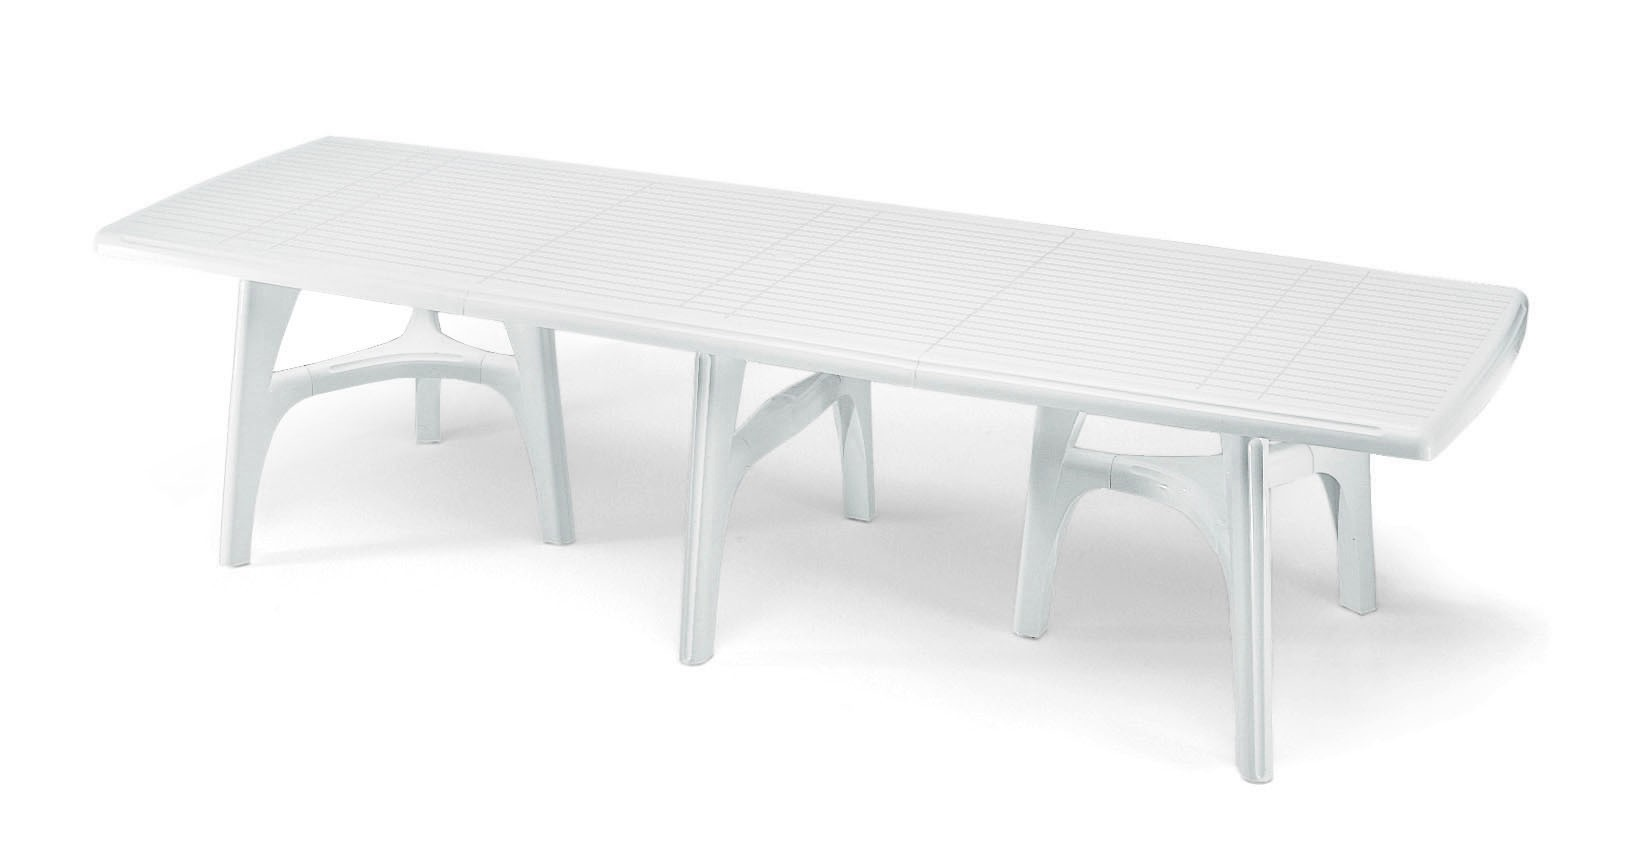 Tavolo resina president 3000 lamacchia mobili da giardino for Mobili da giardino in resina